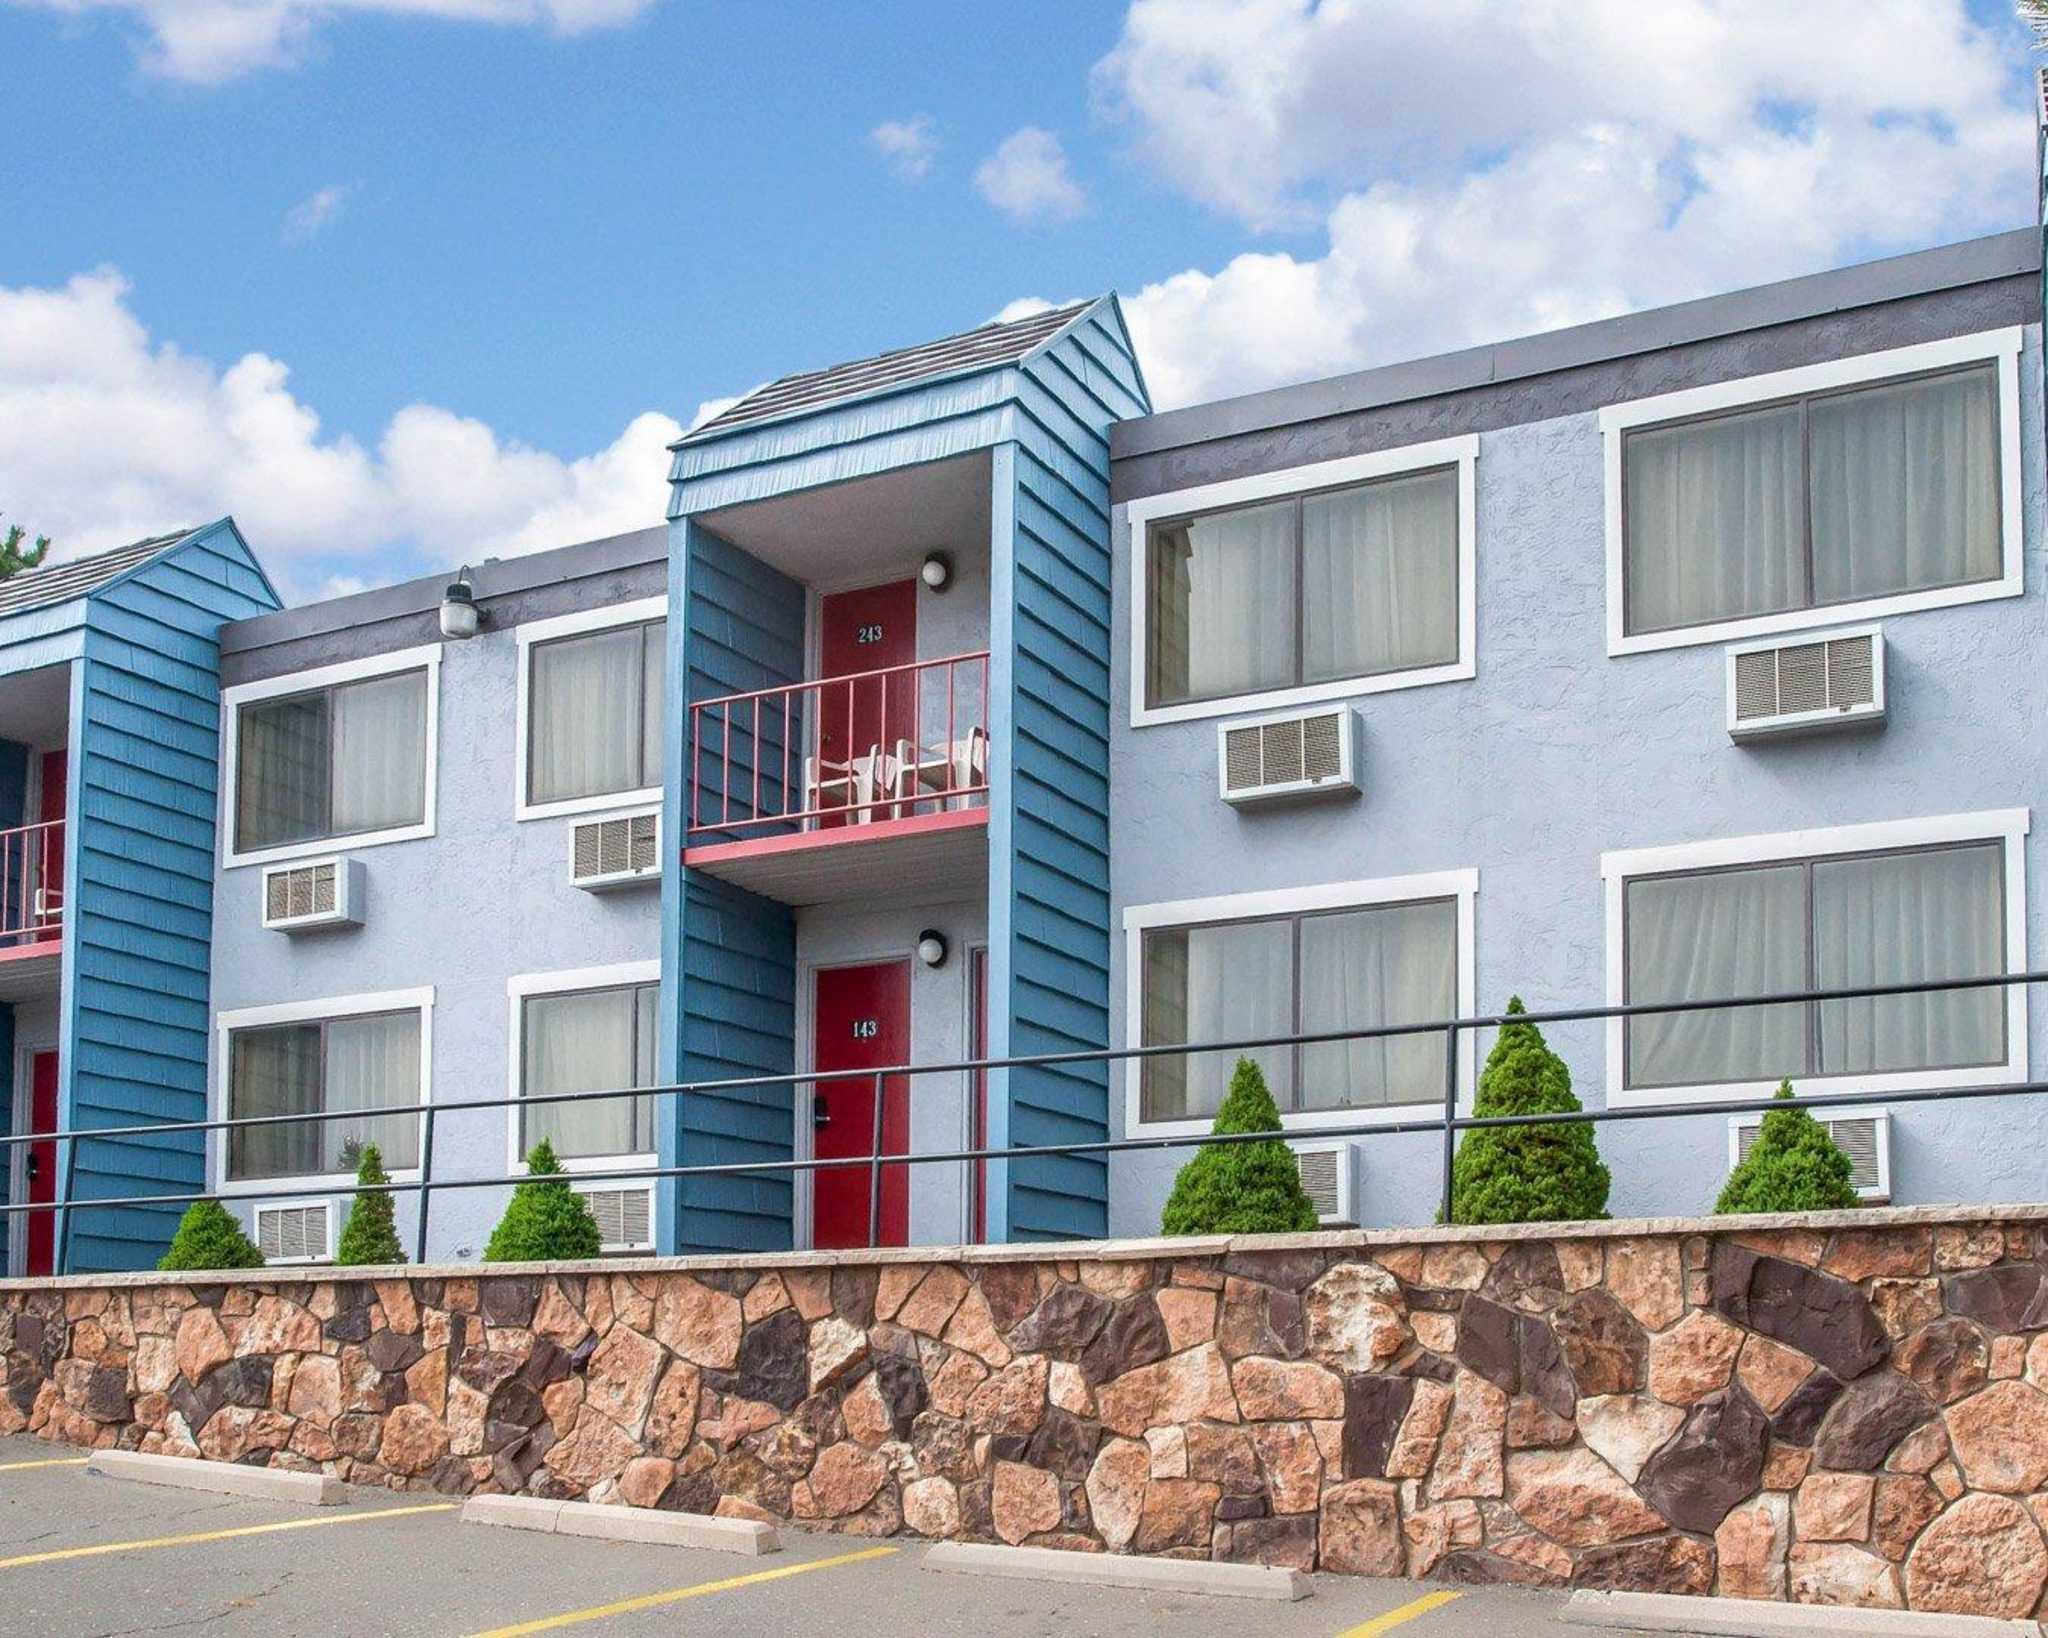 Rodeway Inn Estes Park Colorado Co Localdatabase Com